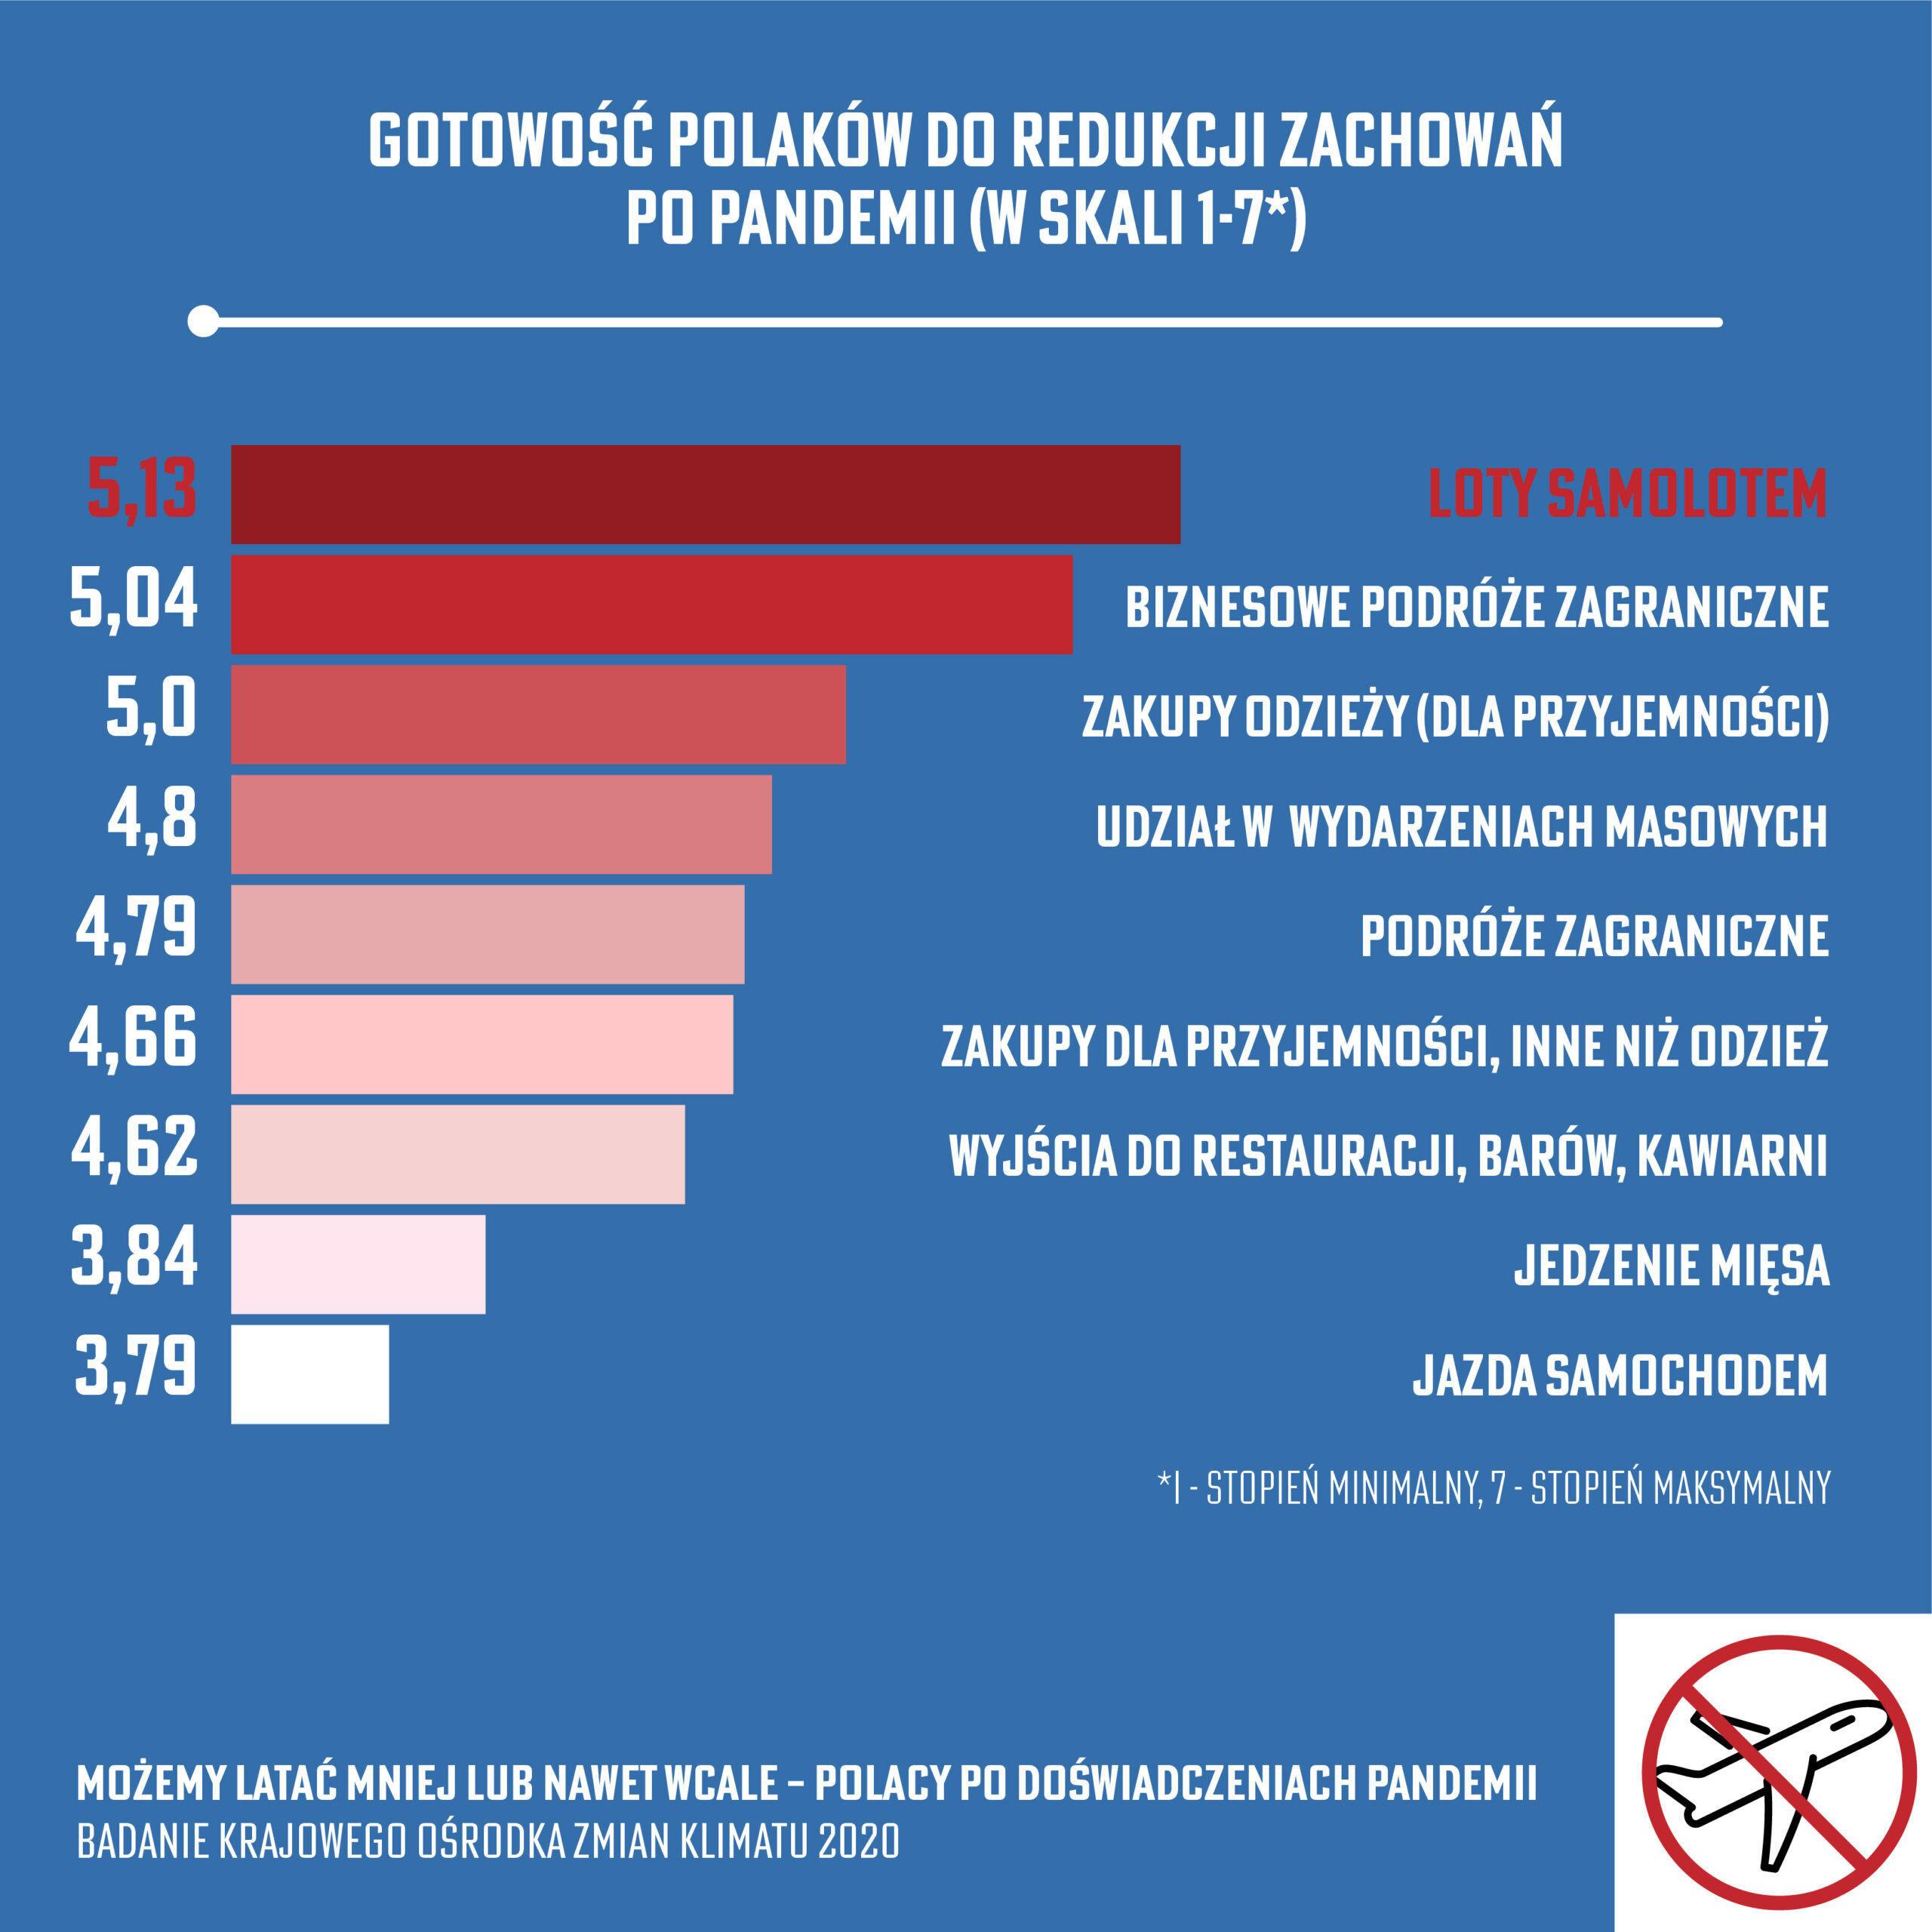 Polak-w-samolocie-a-pandemia_badanie_KOZK_1